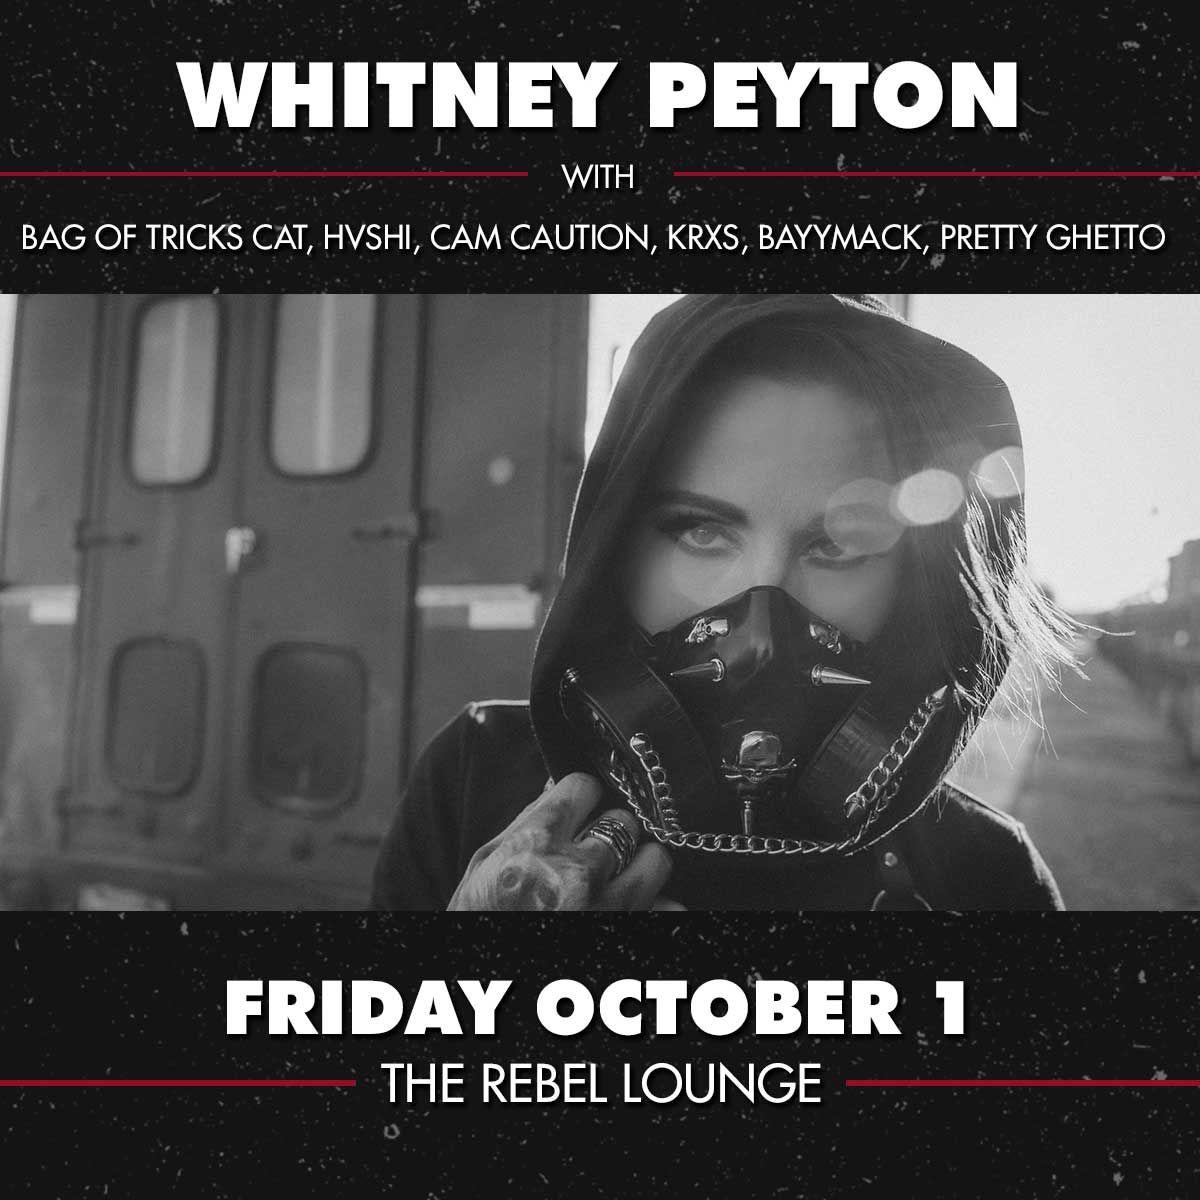 WHITNEY PEYTON: